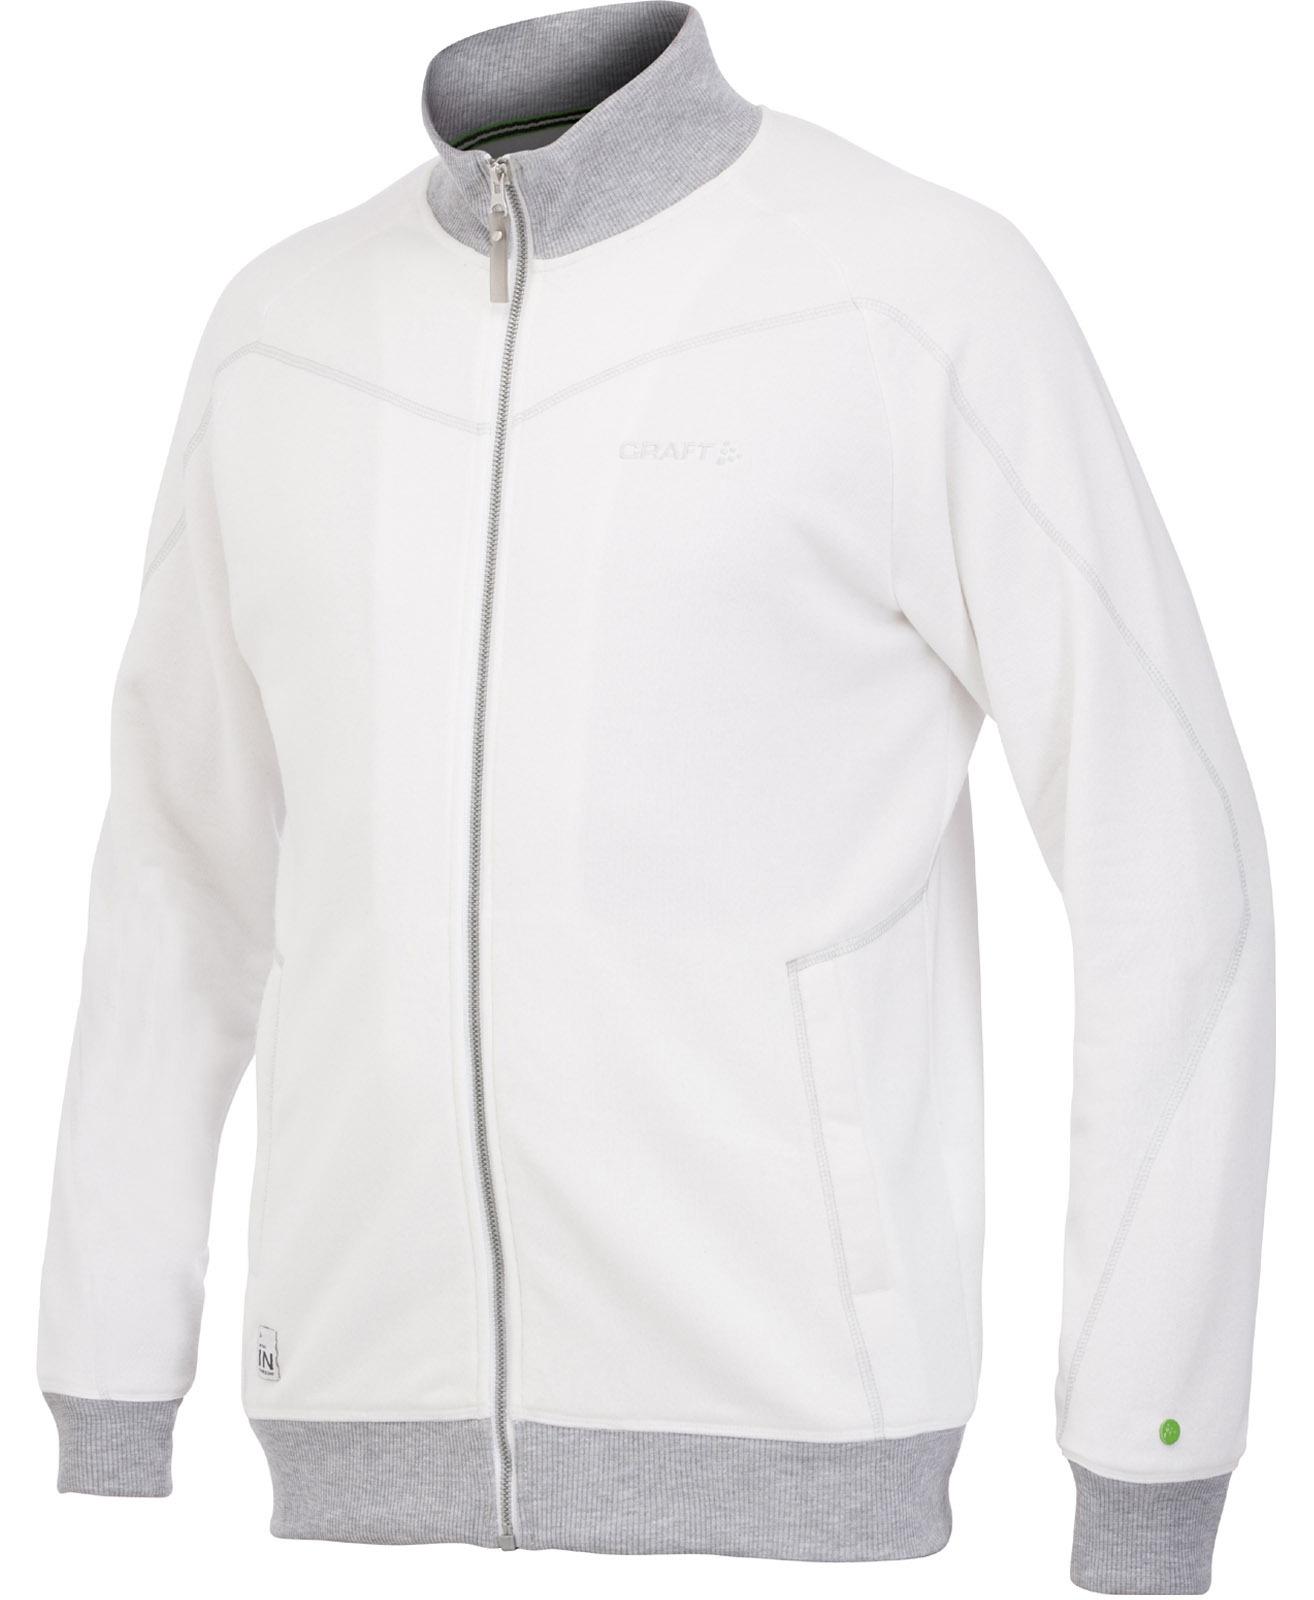 Мужская флисовая куртка Craft In the Zone белая (1902636-2395)